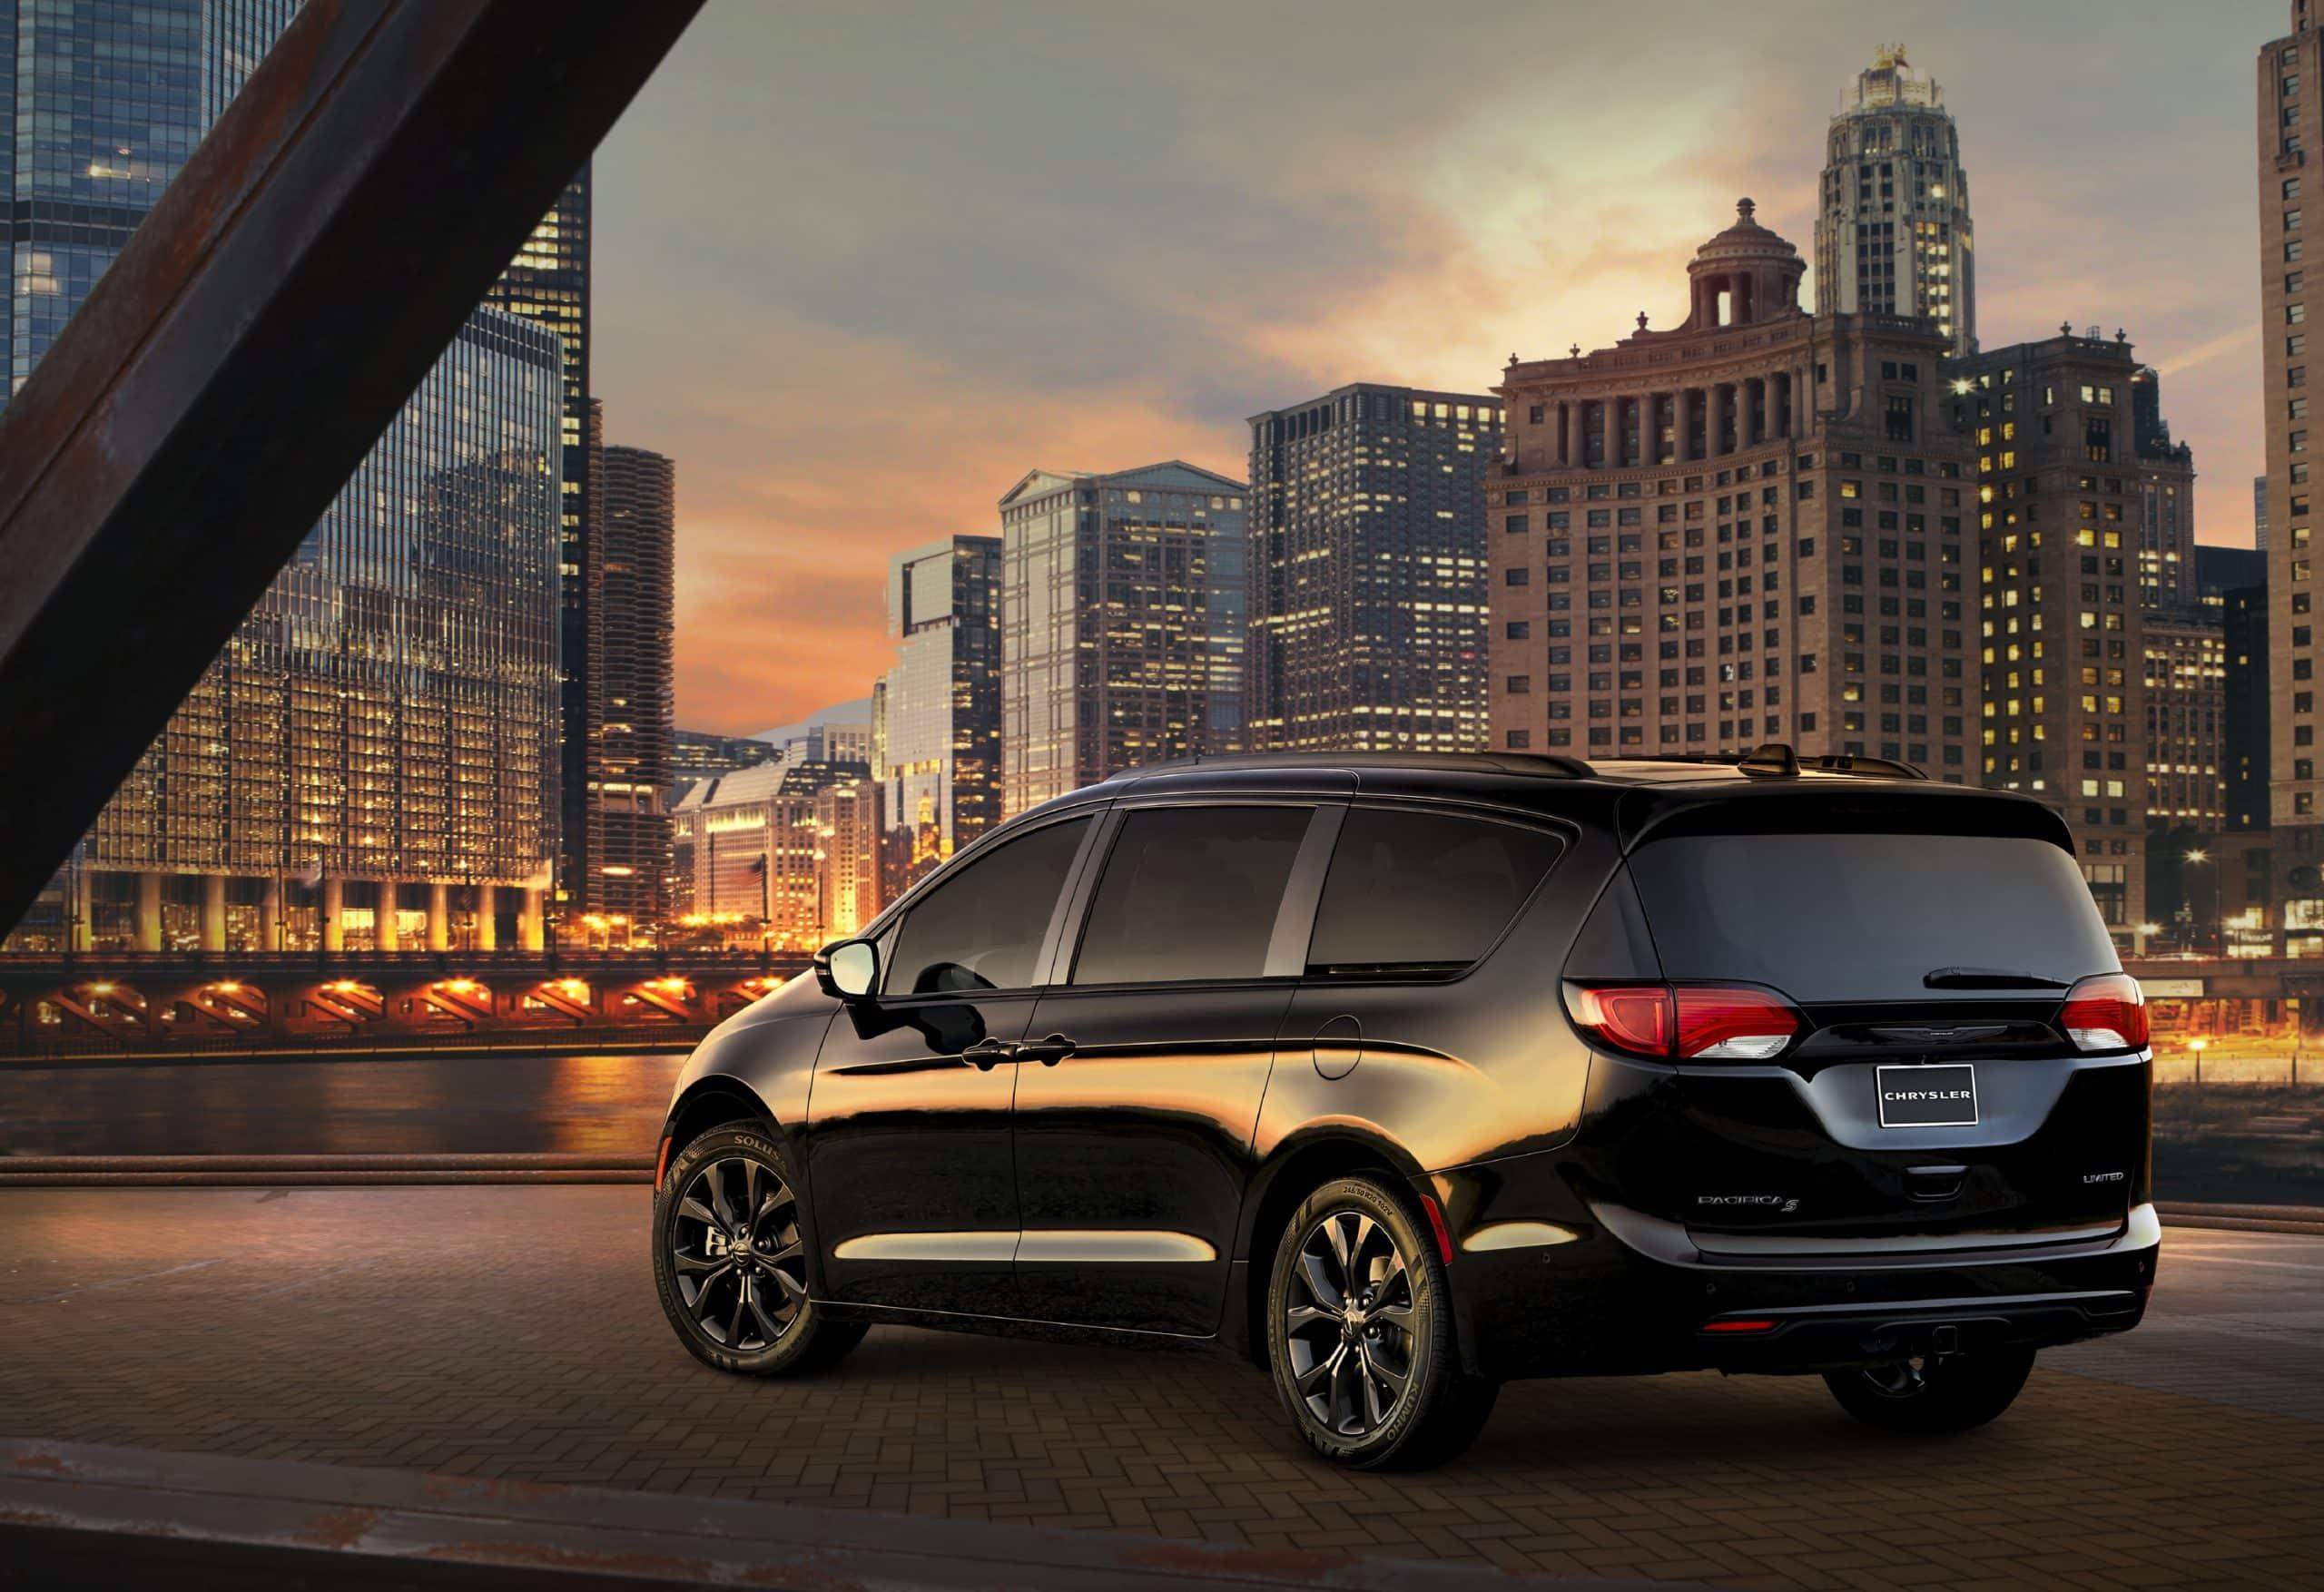 2020 Chrysler Pacifica Hybrid scaled Los 20 mejores autos híbridos enchufables asequibles para 2020